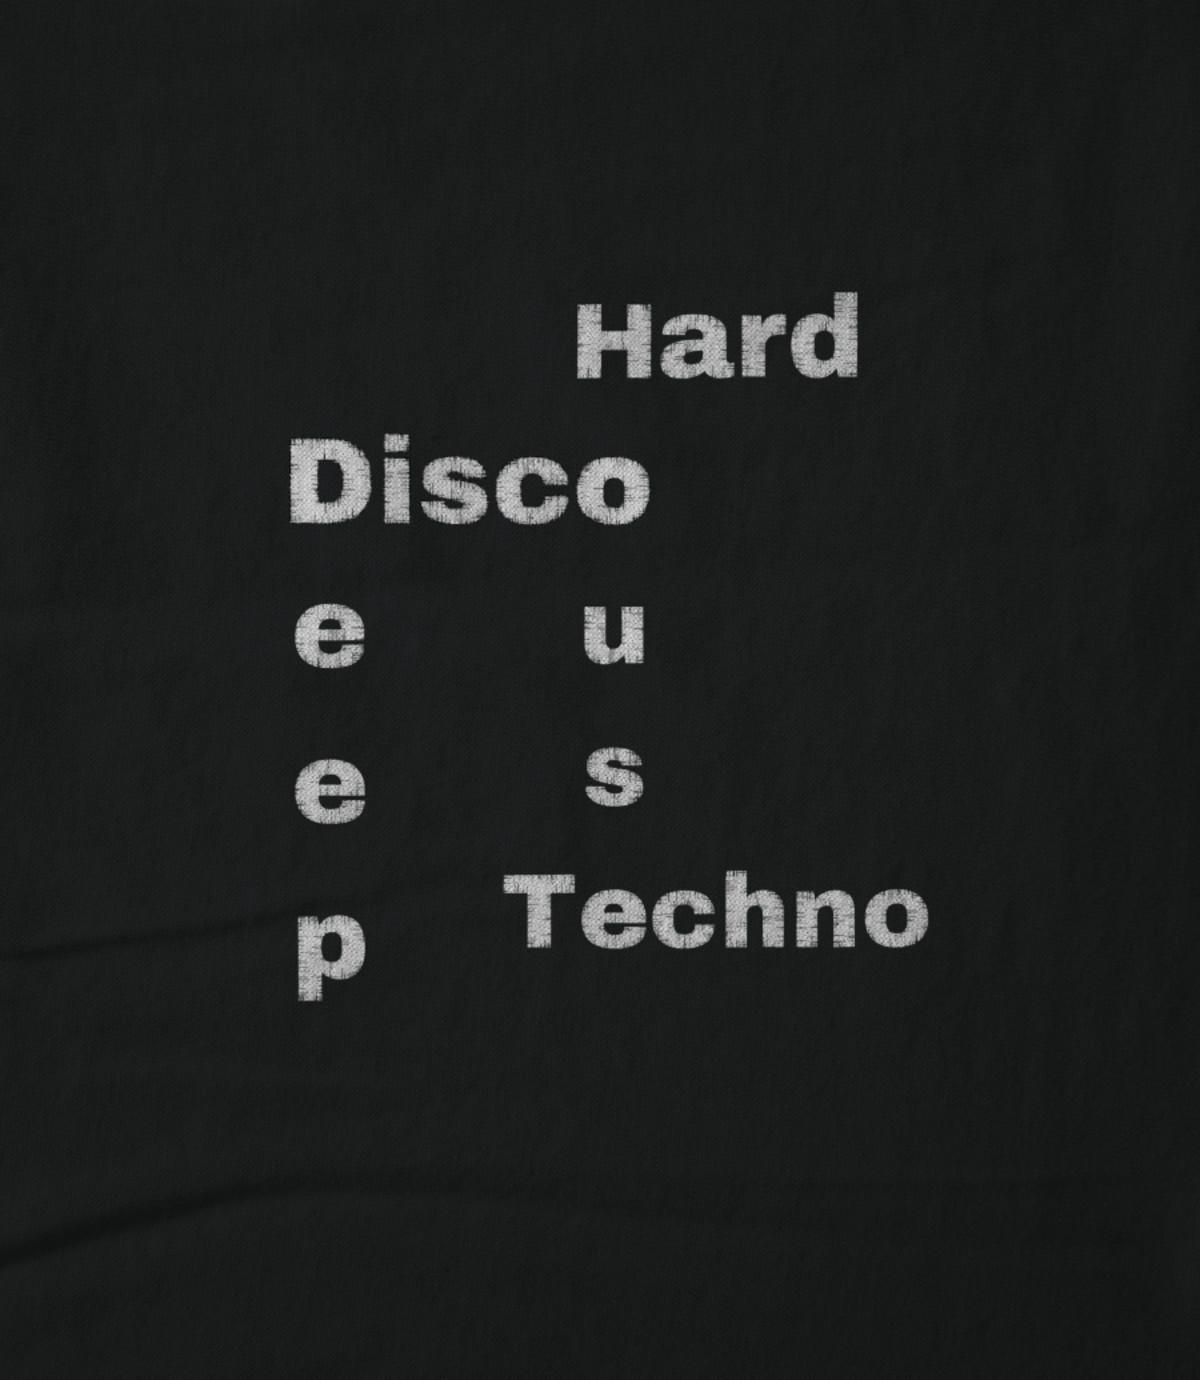 Beau3tiful disco   deep house   hard techno 1545637403